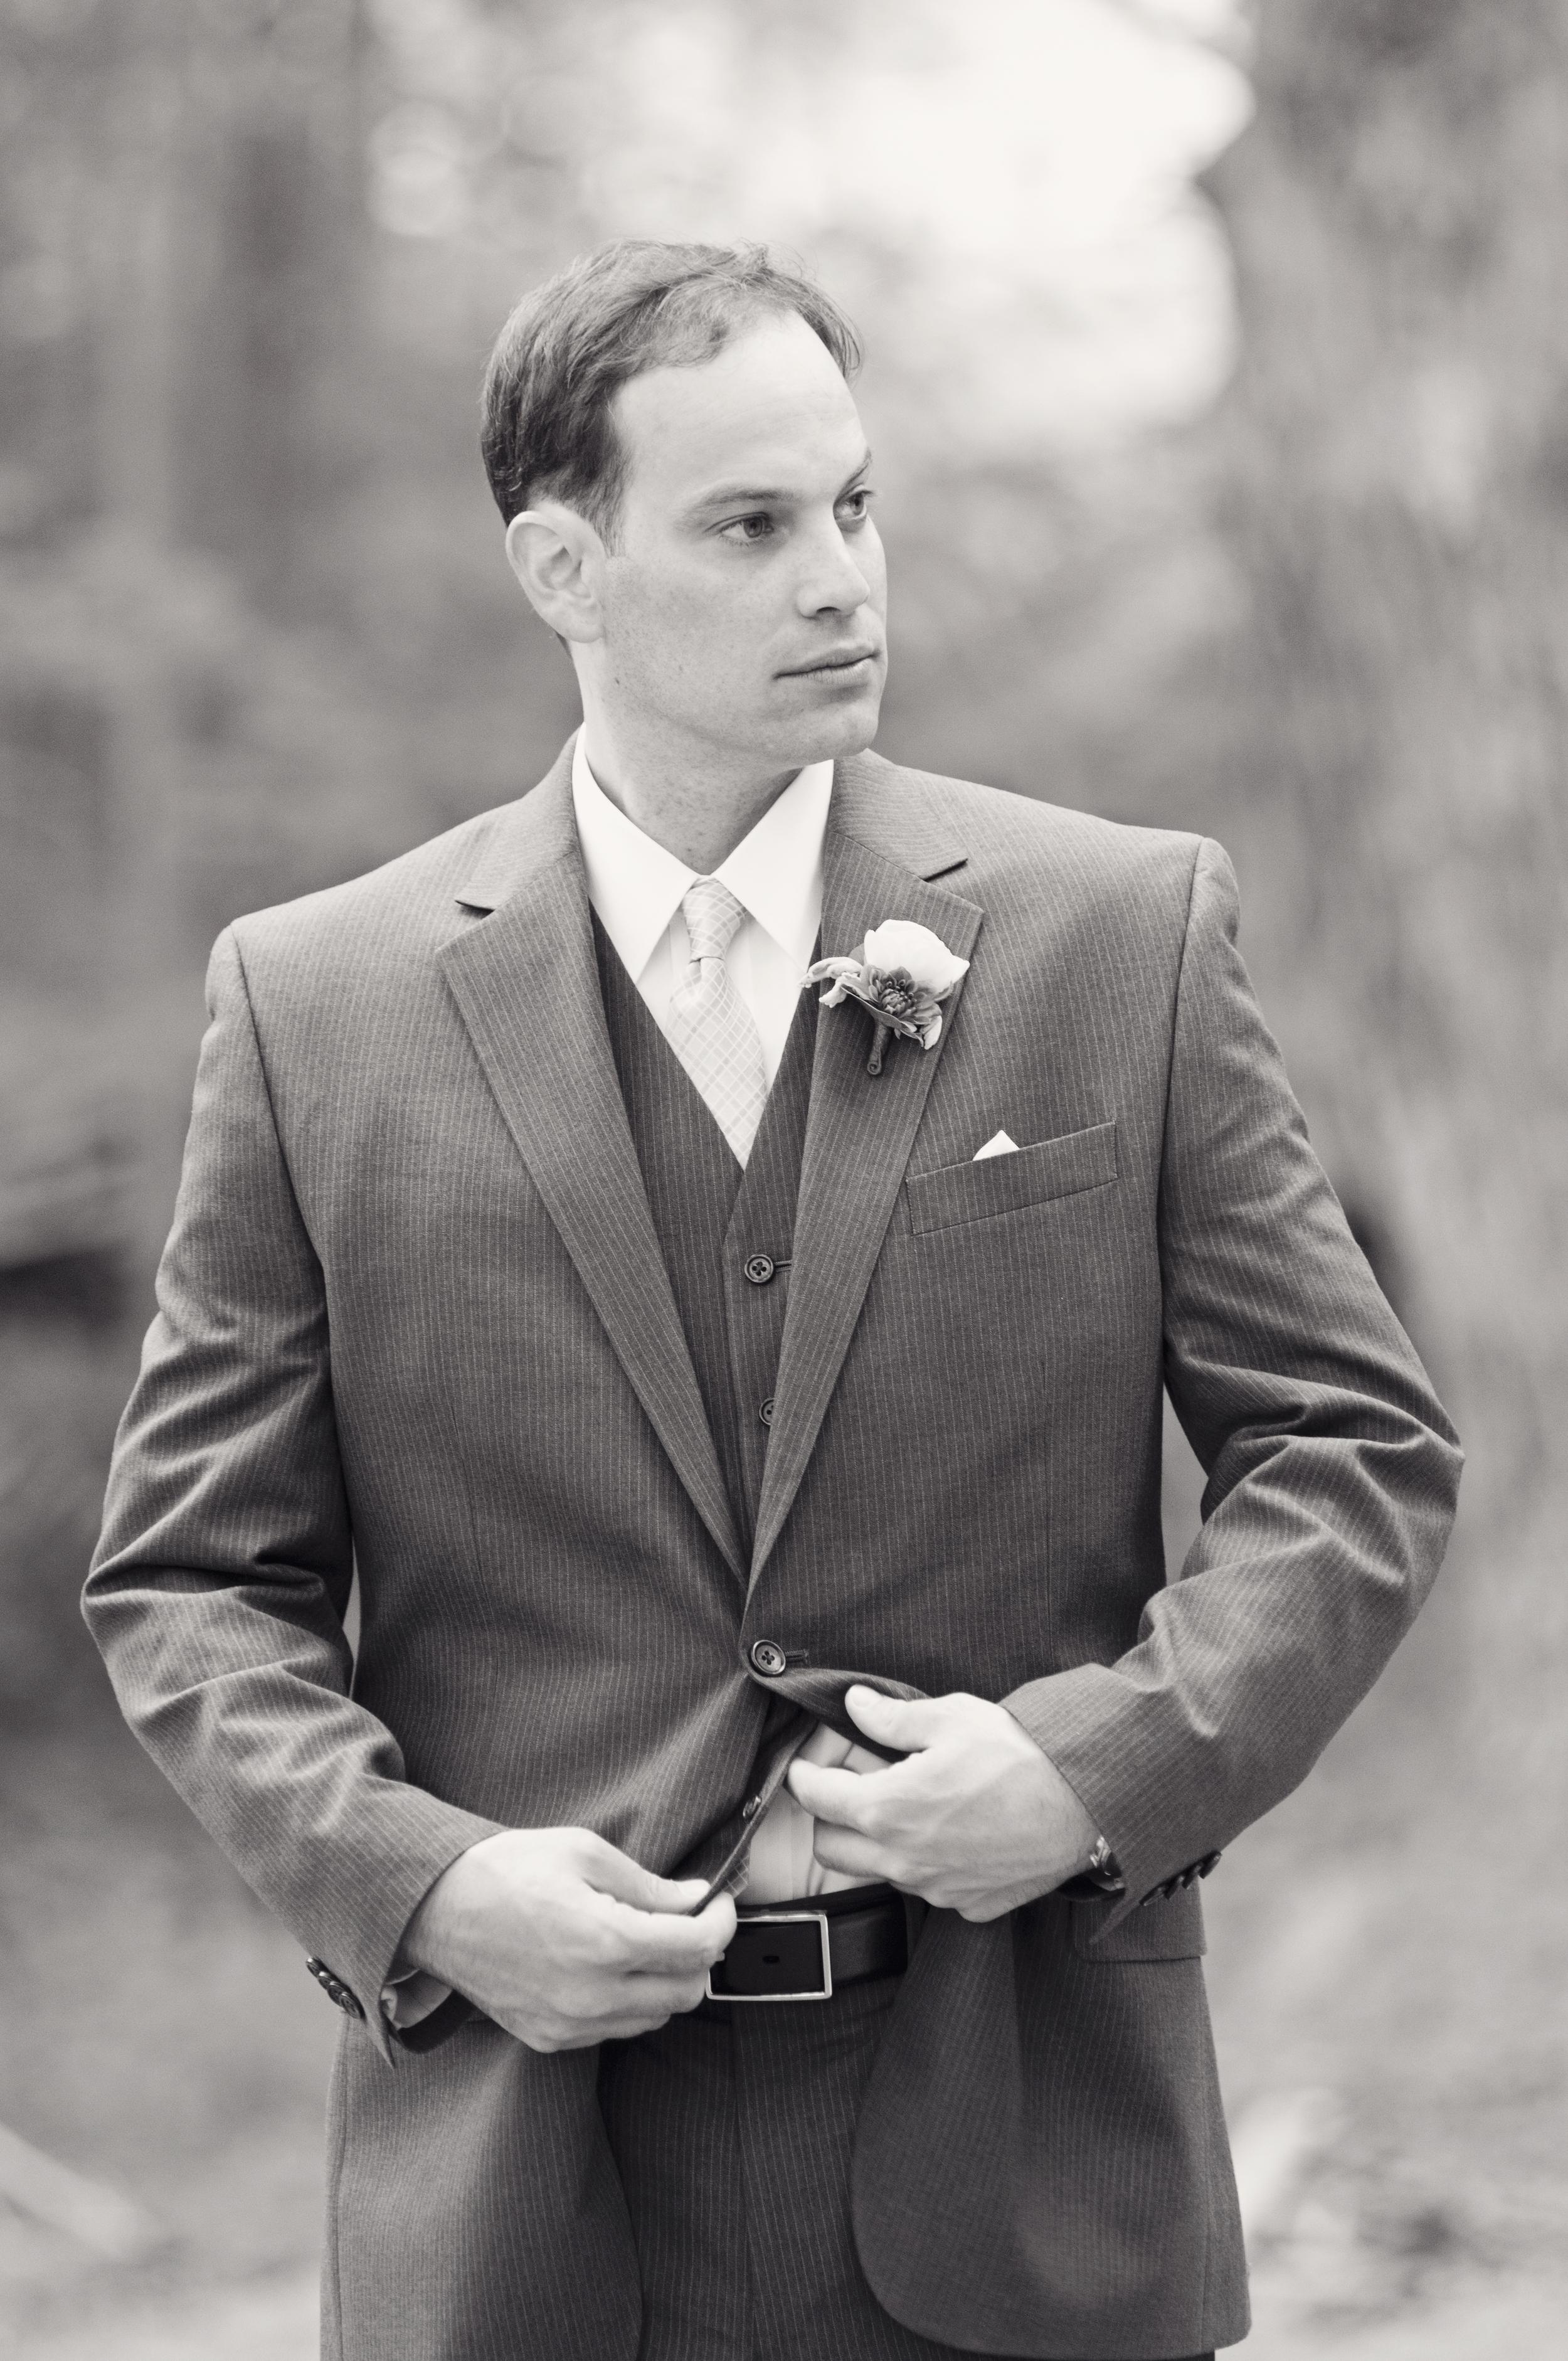 Angela_Chicoski_CT_wedding_photographer_054.jpg